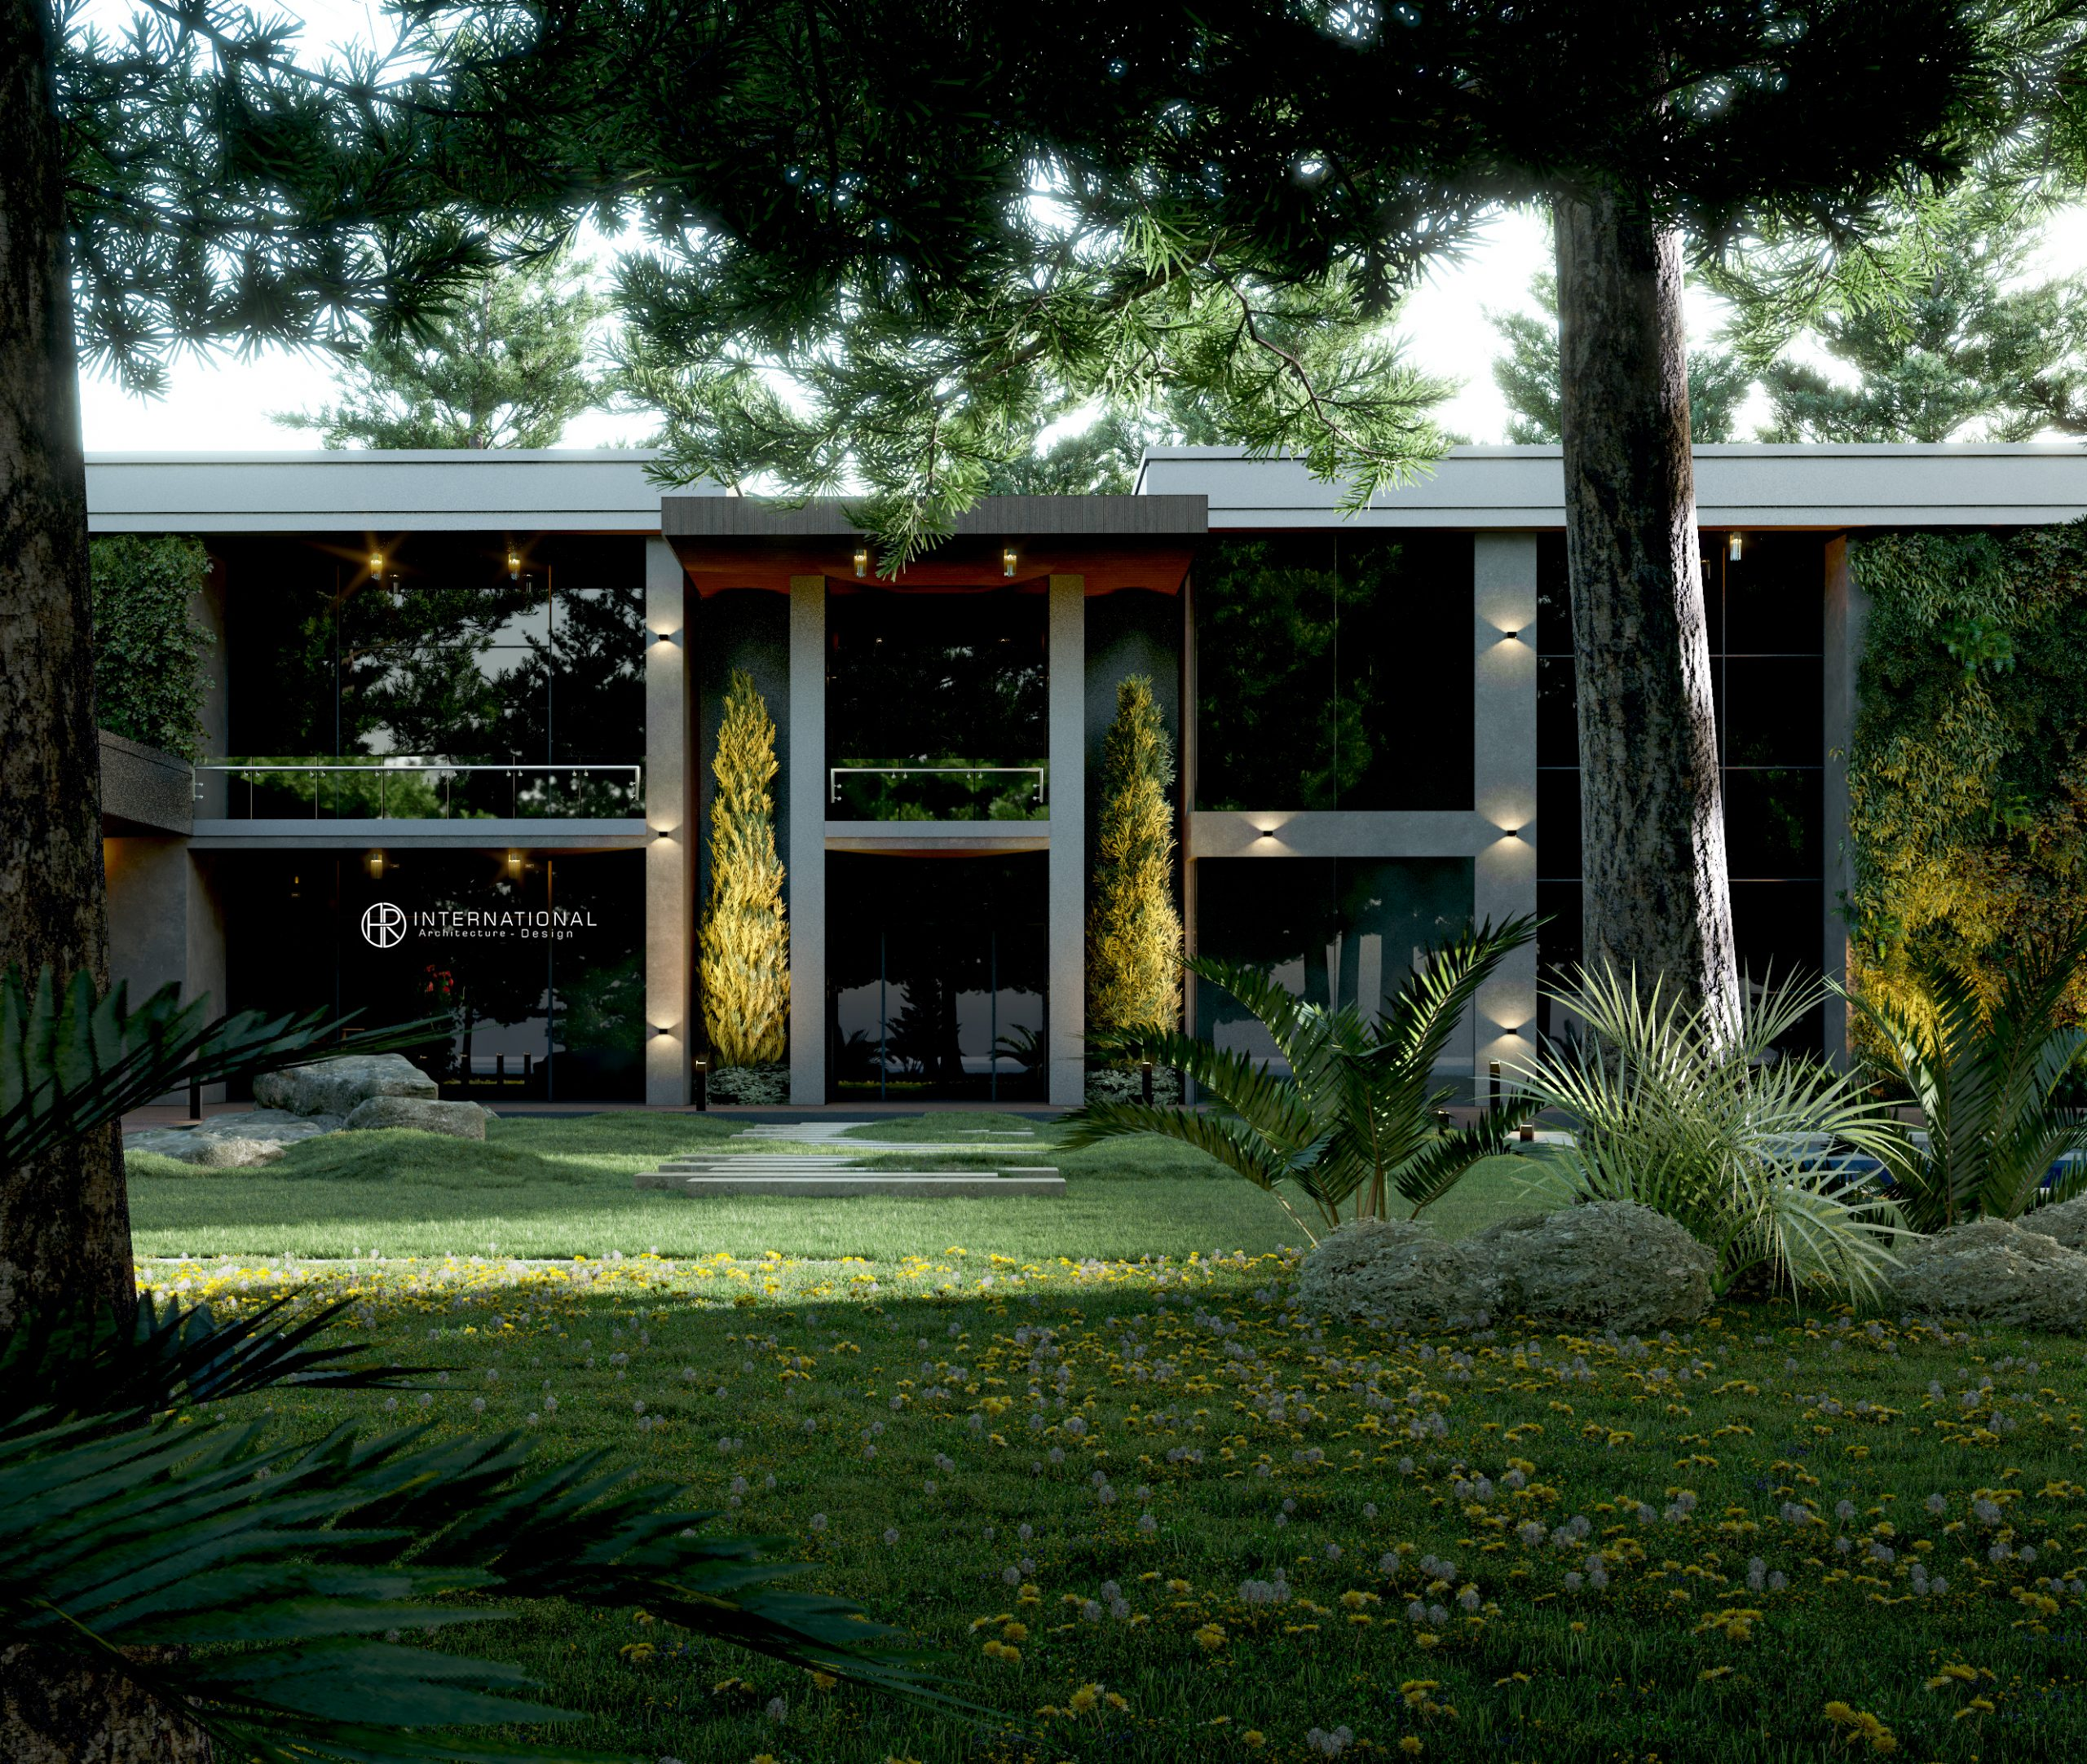 landscape - trees - villa - sun light